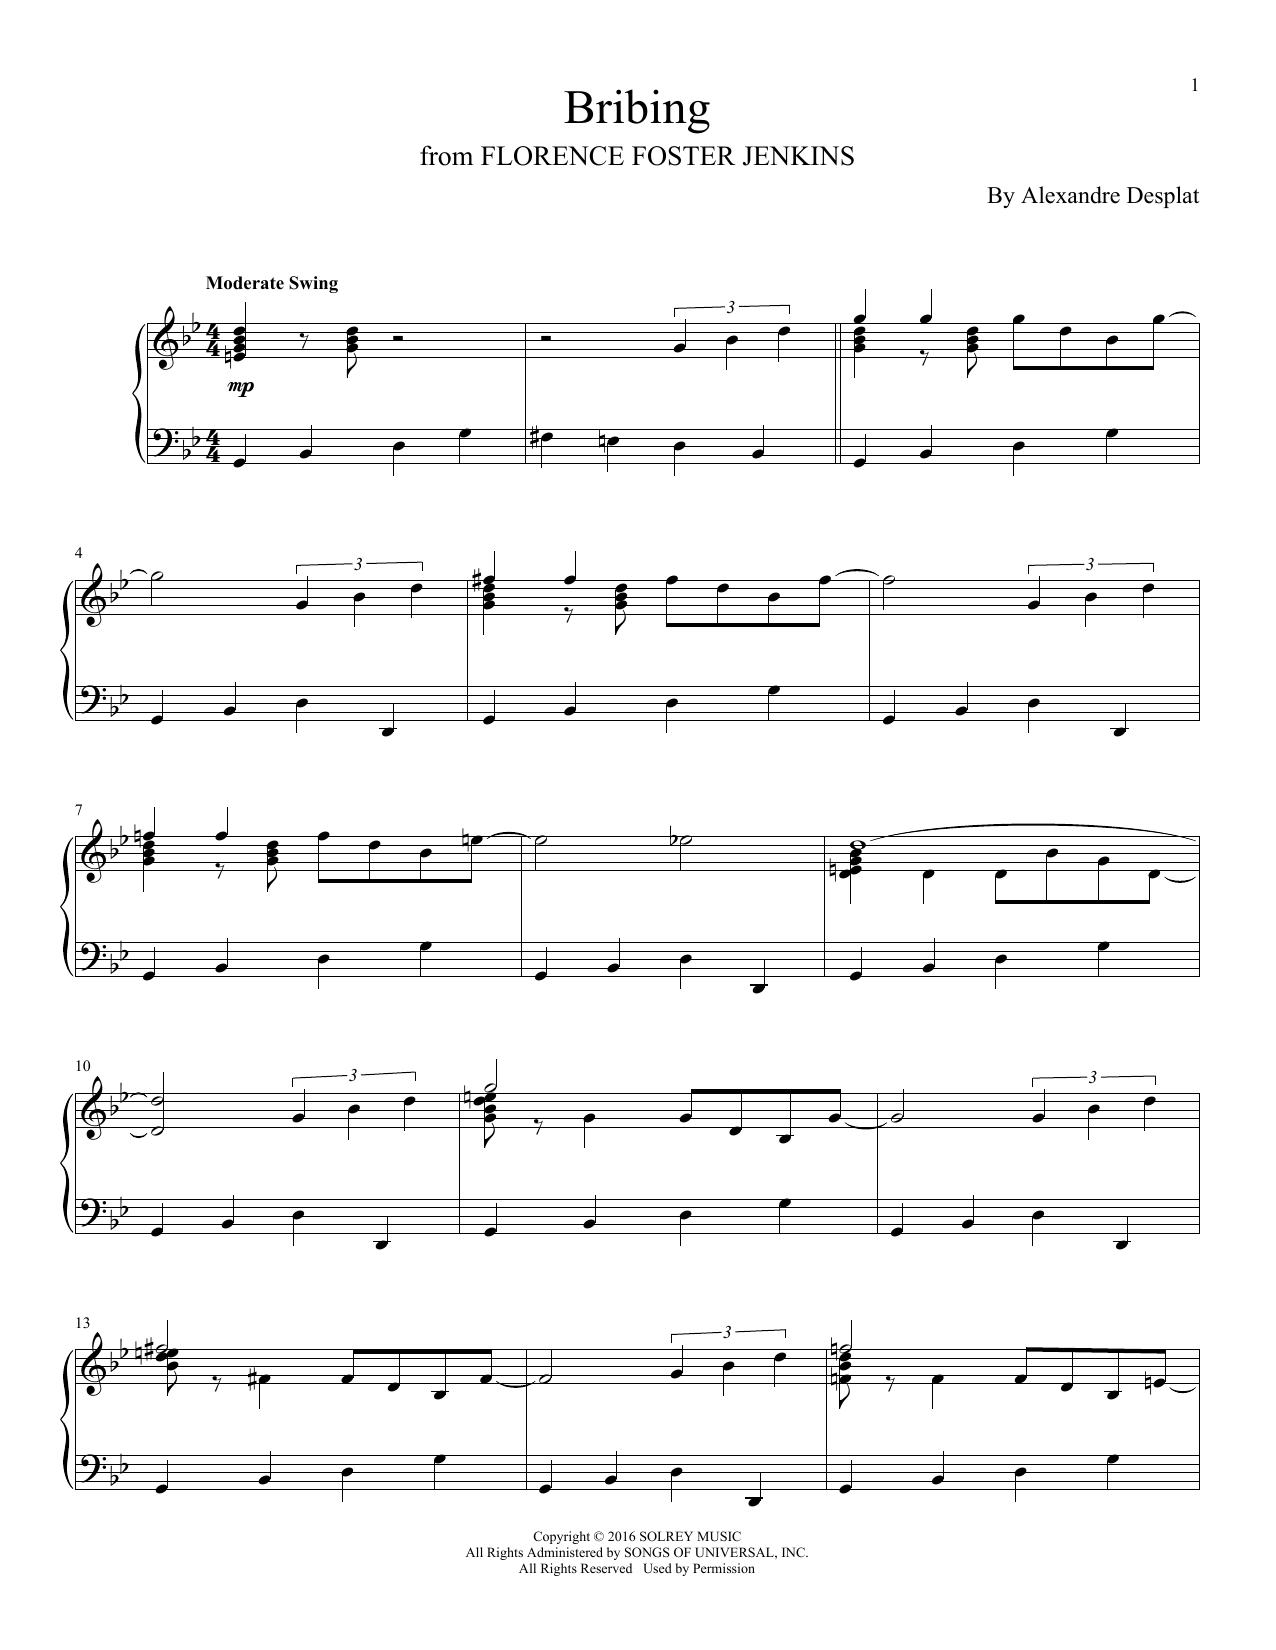 Alexandre Desplat Bribing sheet music notes and chords. Download Printable PDF.